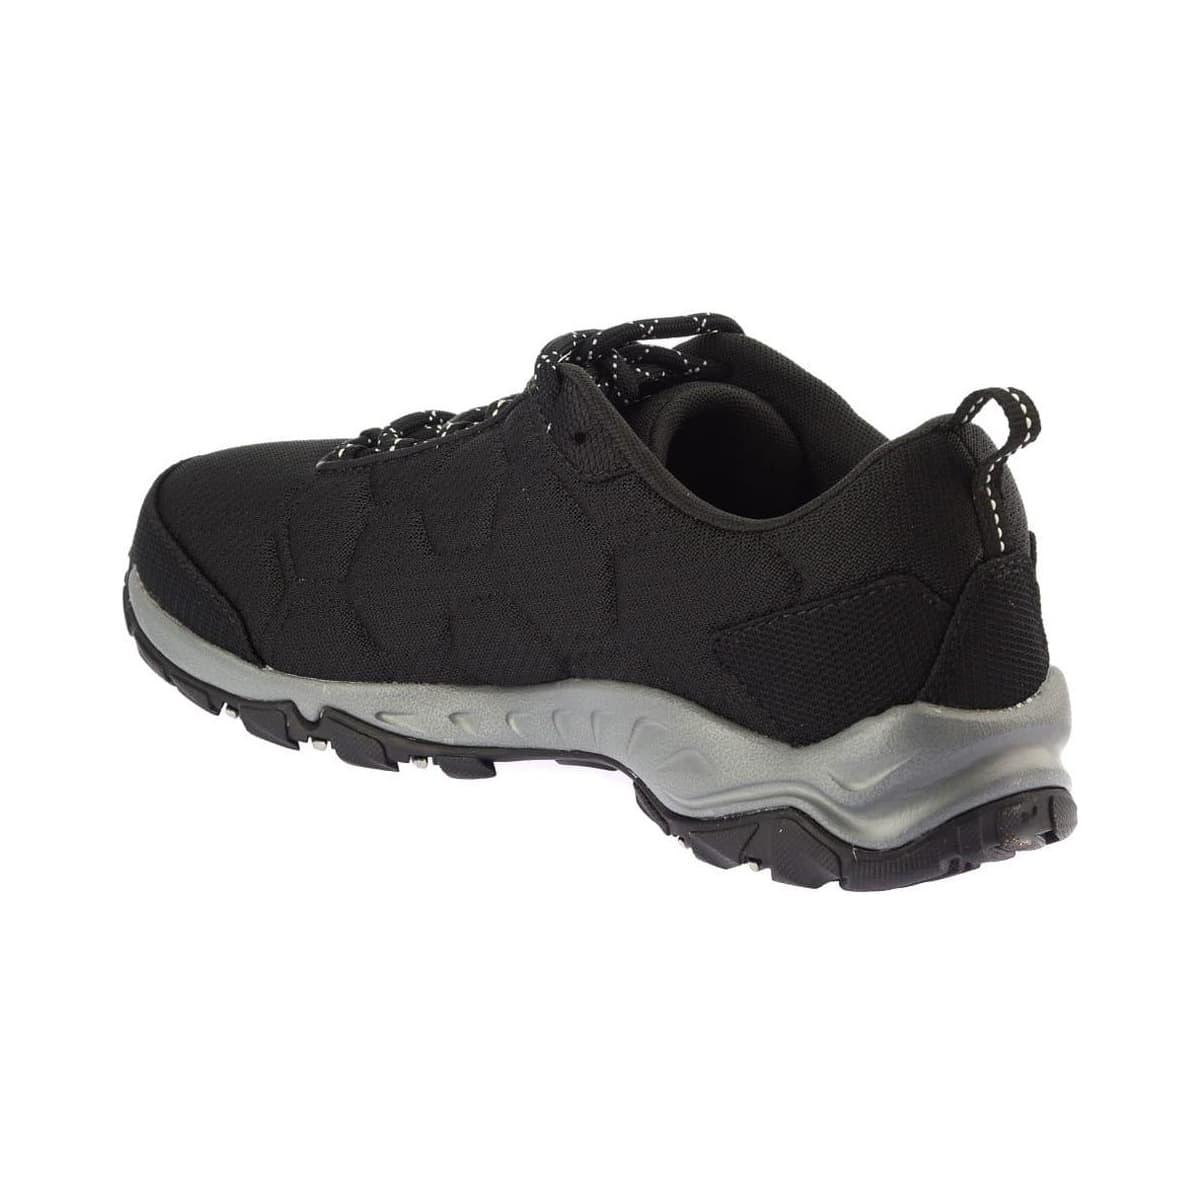 Firecamp™ Remesh Erkek Siyah Outdoor Ayakkabı (BM1905_010)